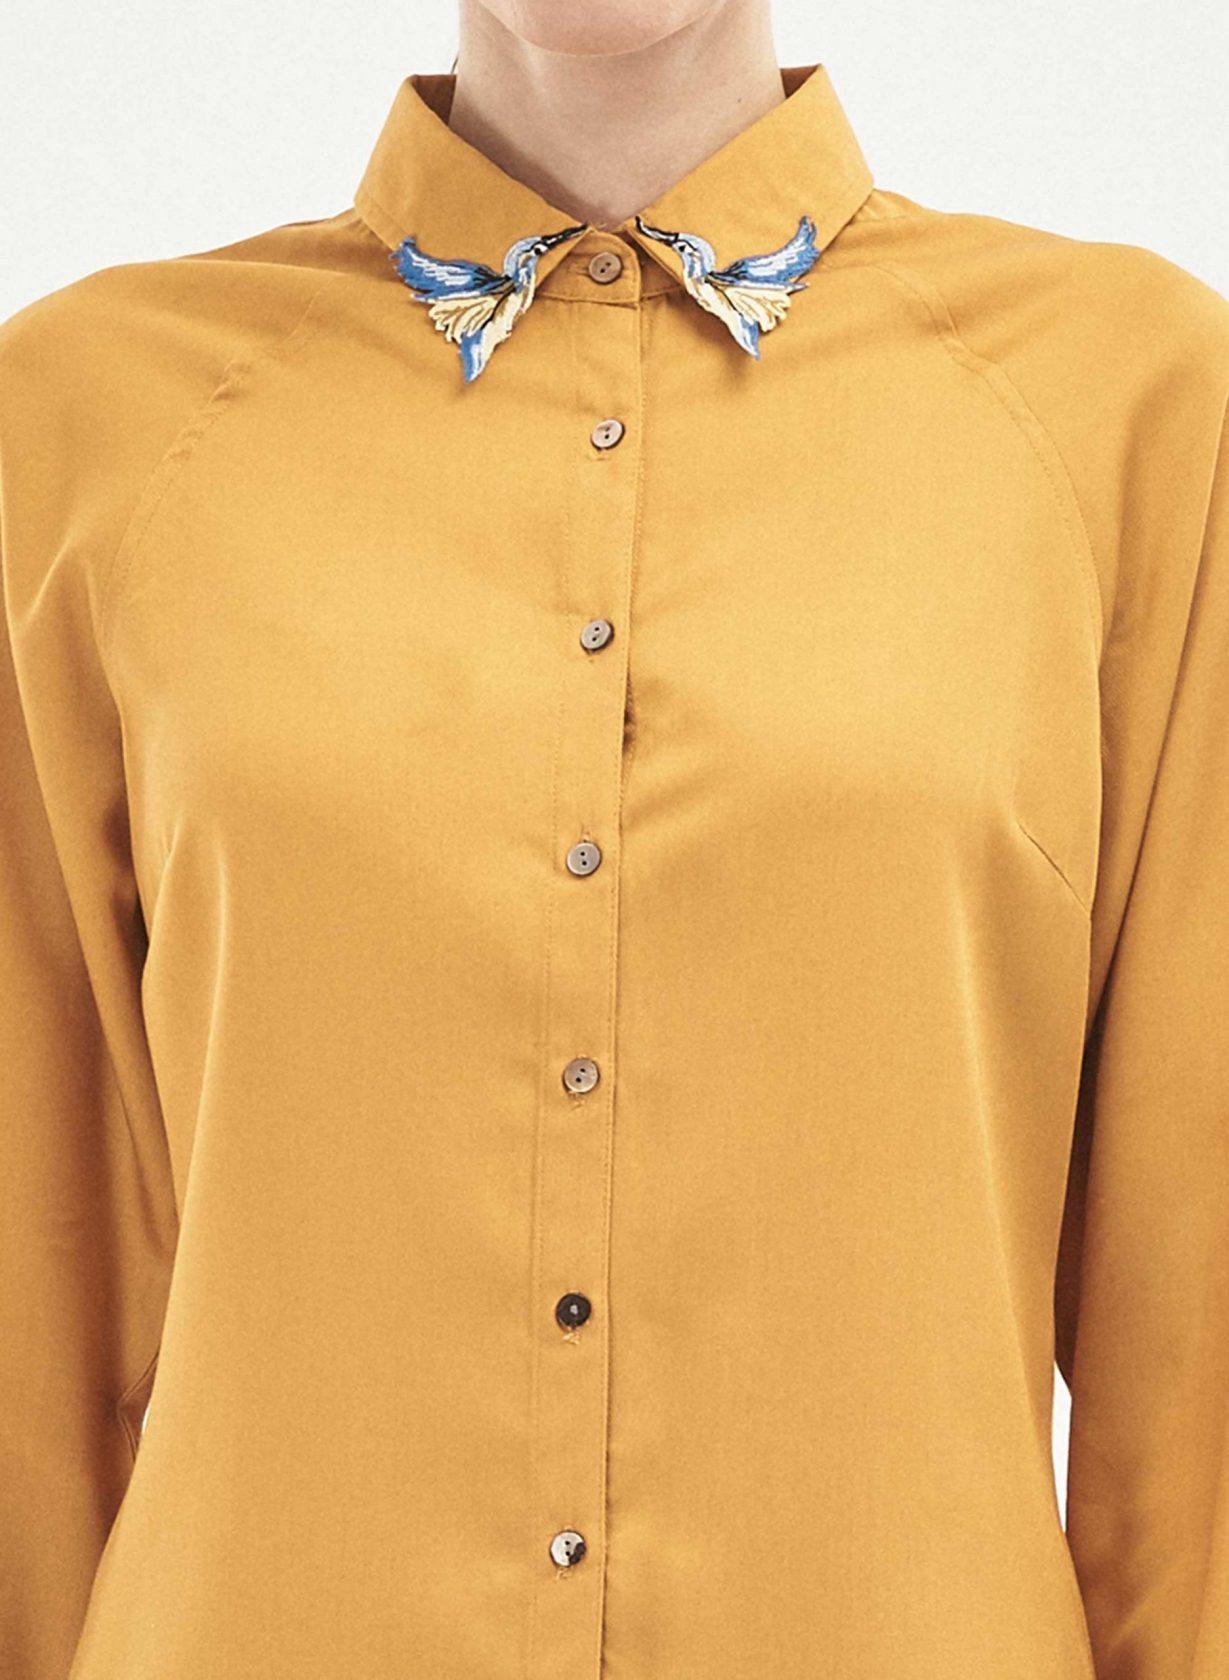 roberta organic fashion Organication Bluse Raglanärmel Kolibri Stickerei senfgelb 1 scaled